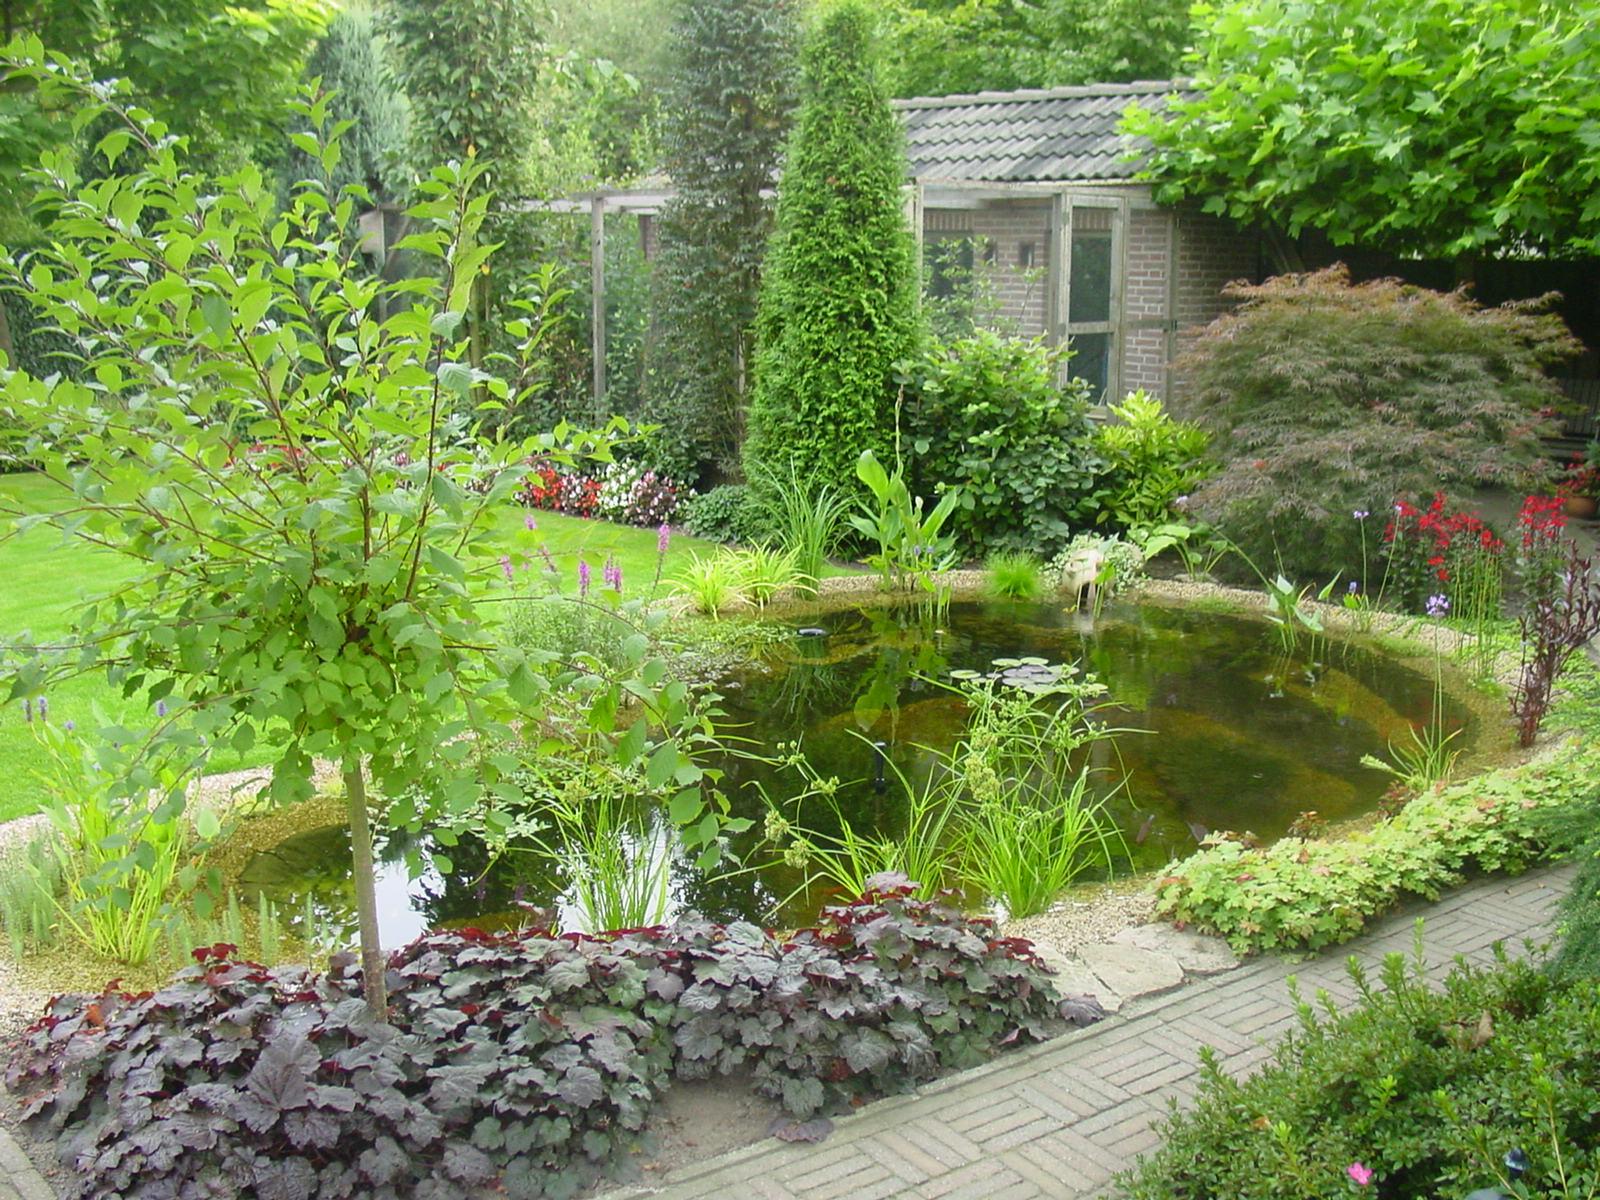 Tuinvijver siervijver terrasvijver vijver aanleggen for Kleine tuinvijver